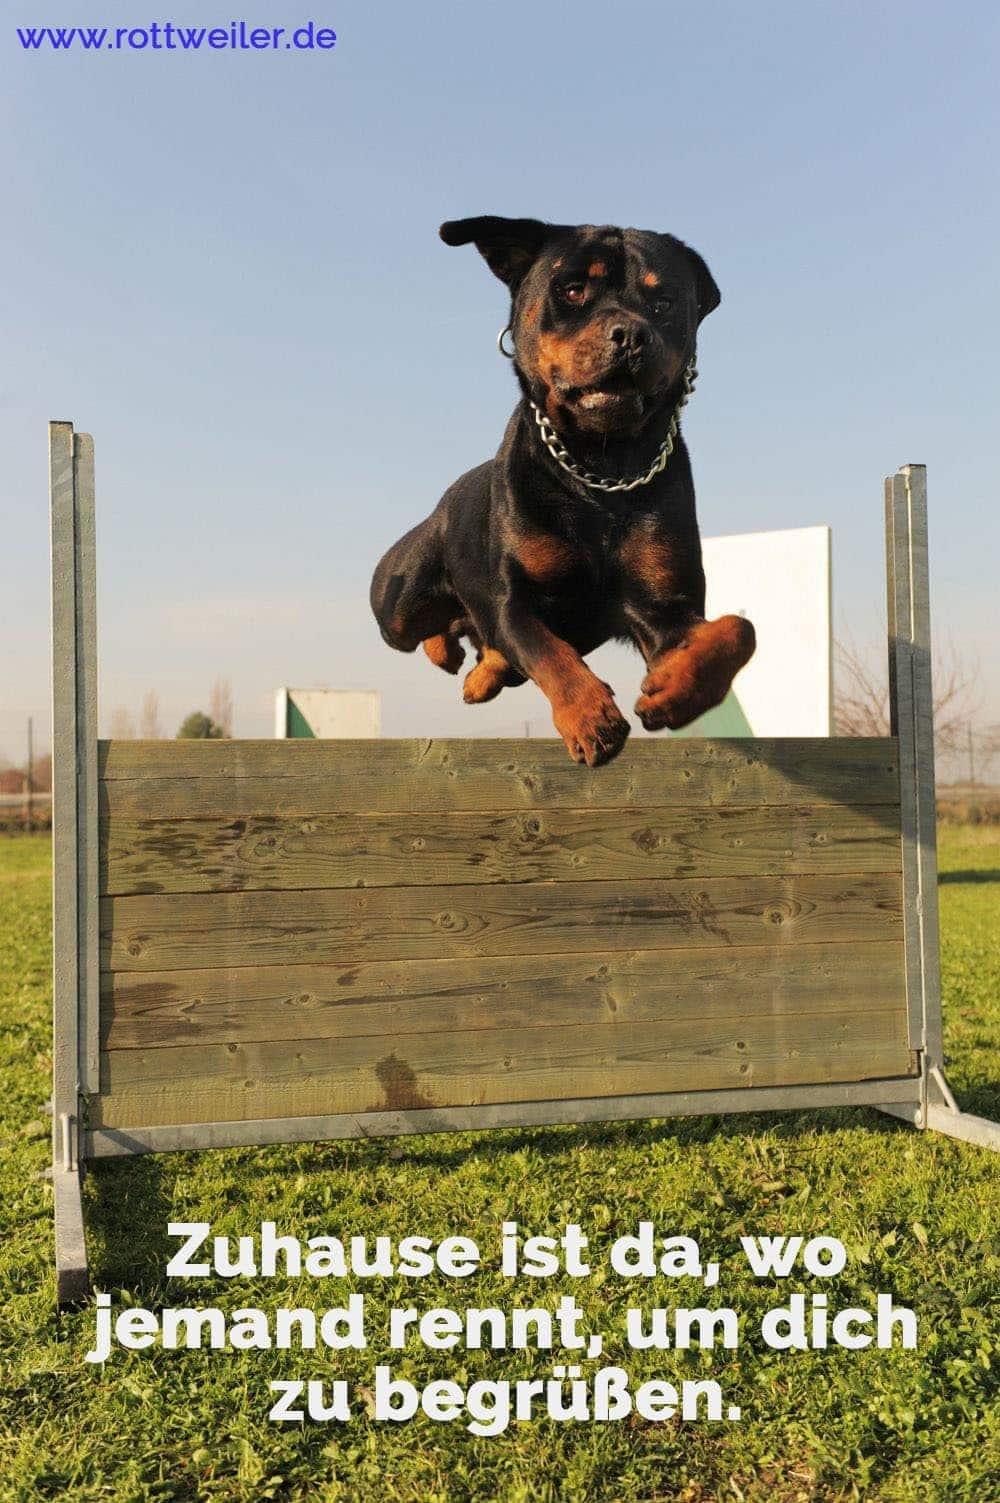 Rottweiler springt über Hinderniss